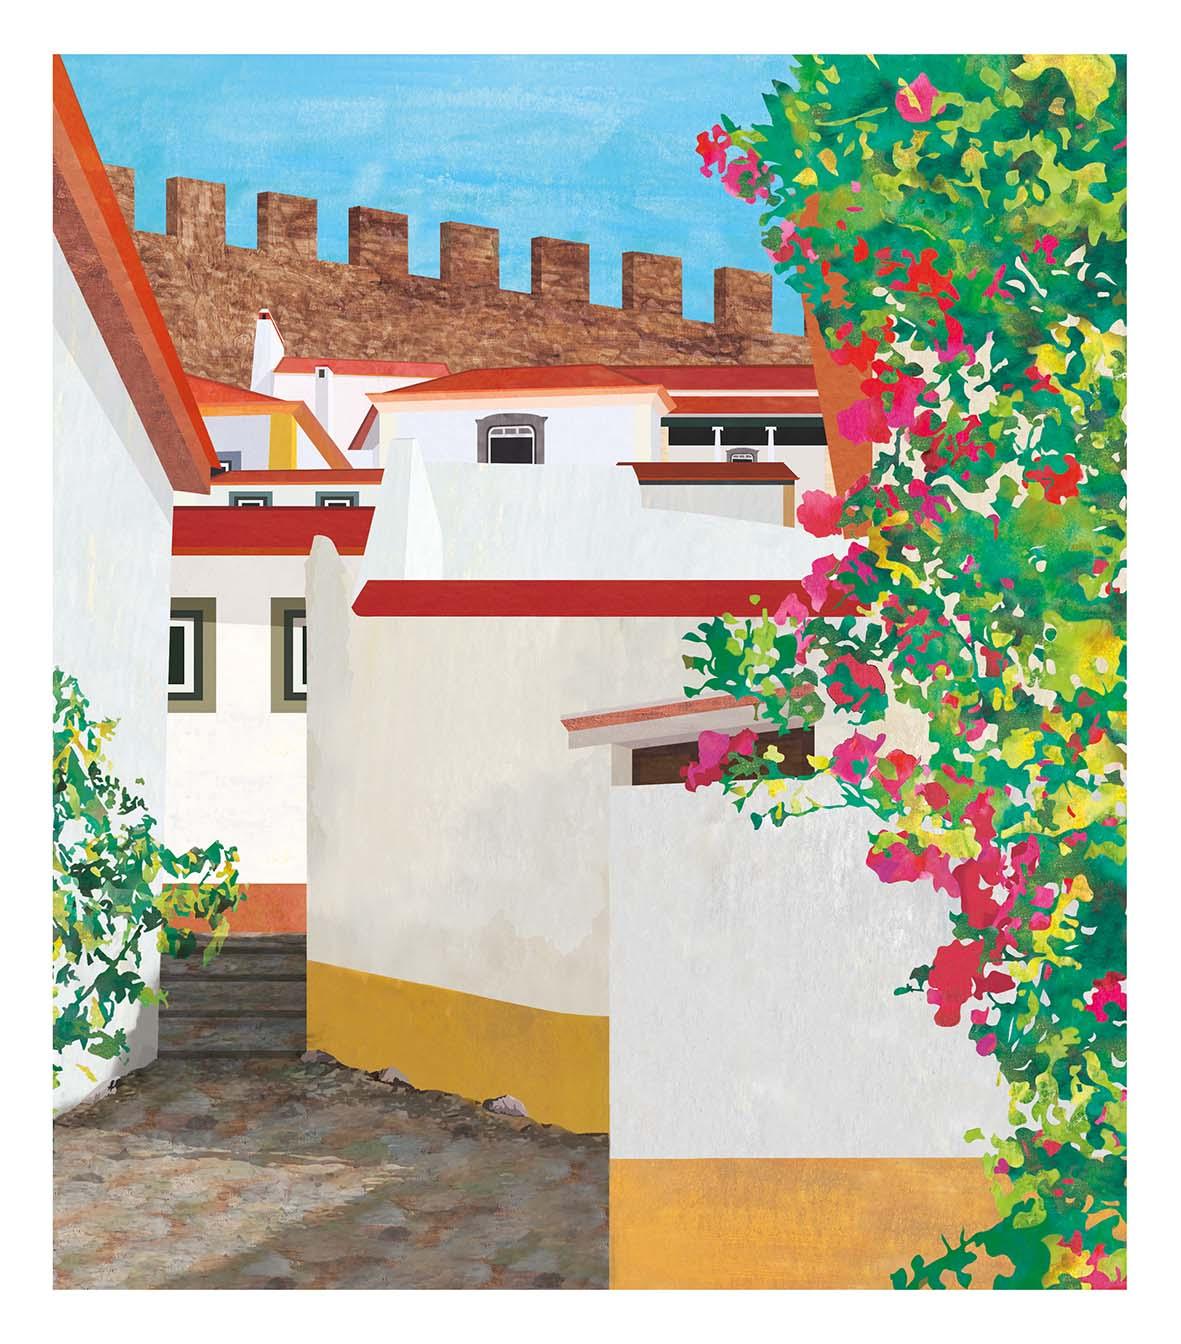 Teresa Arroyo Corcobado, Illustration, Portugal, Óbidos